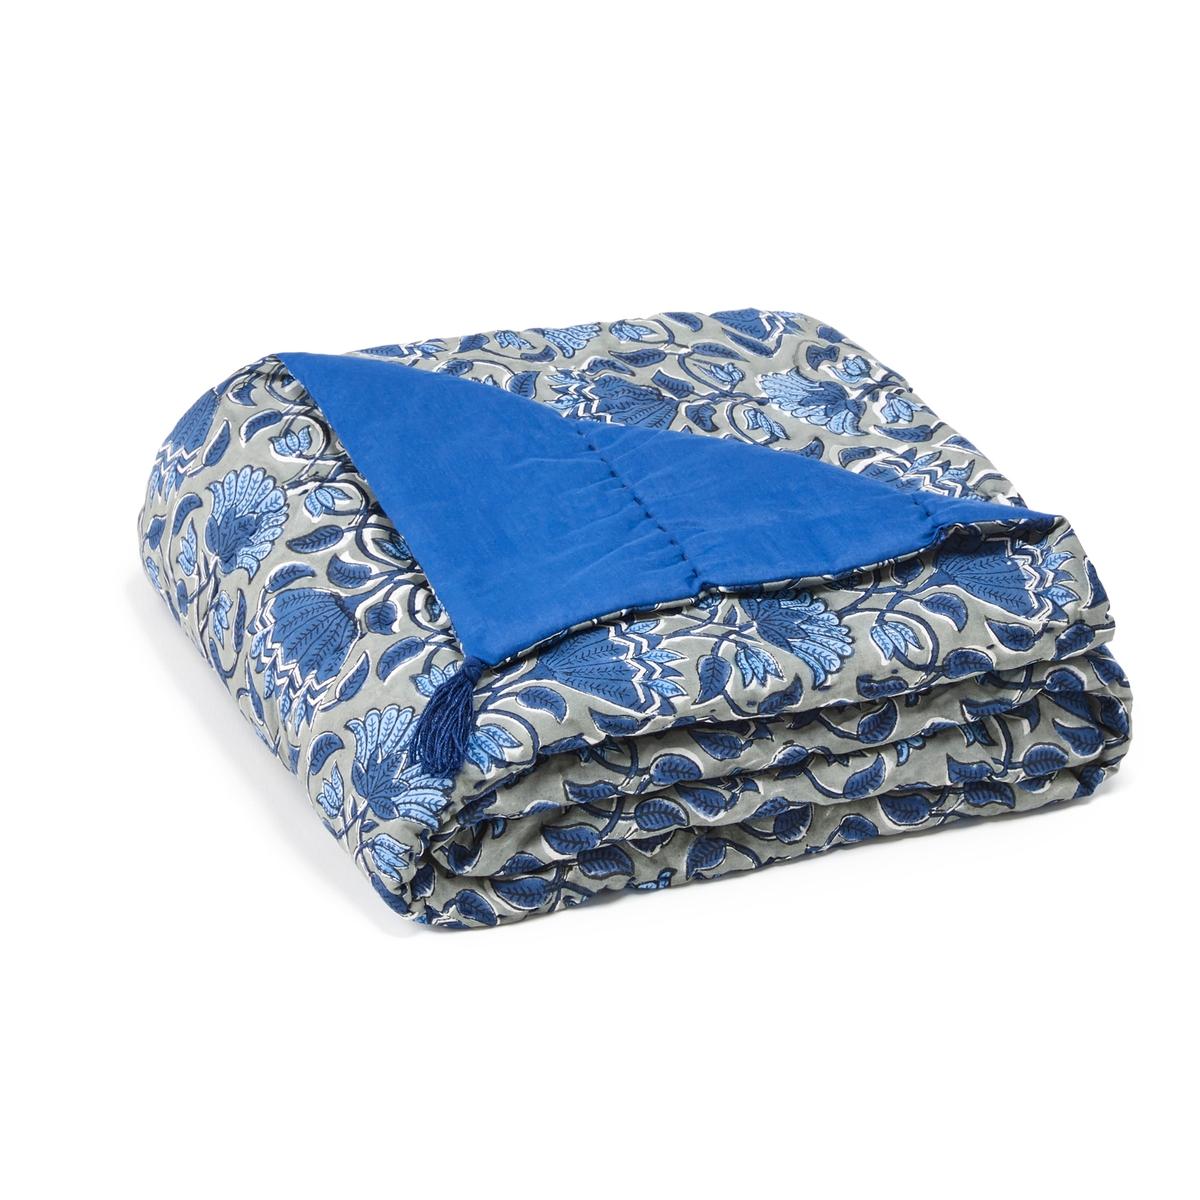 Плед La Redoute С вышивкой в стиле Кантха Zasti 110 x 180 cm синий сумка с вышивкой и кисточками charlie pouch